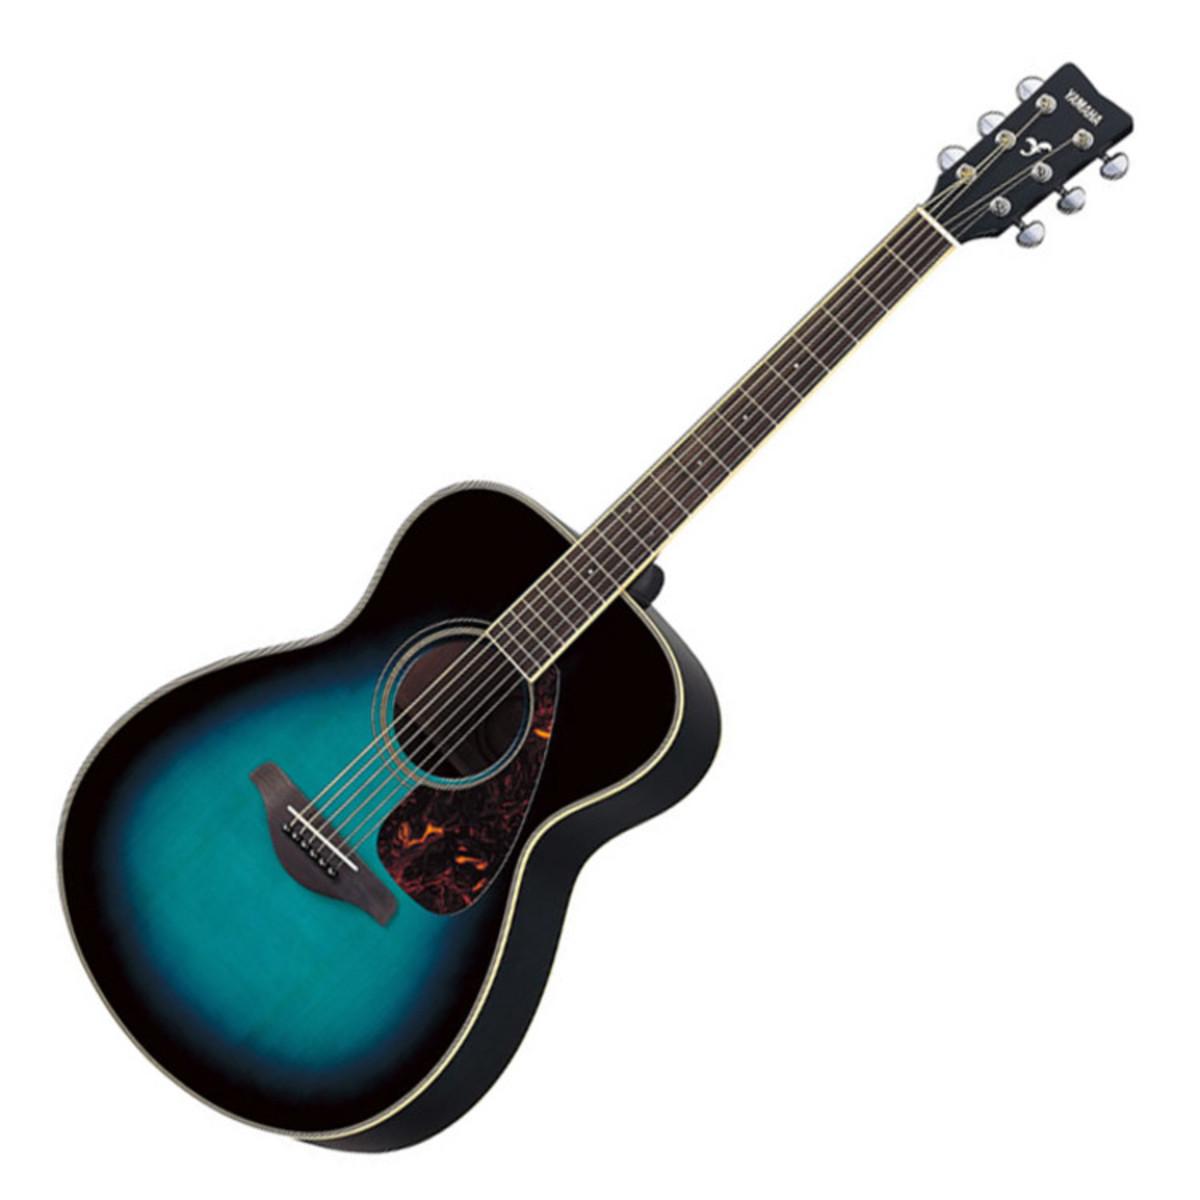 yamaha fs720s acoustic guitar cobalt blue aqua nearly